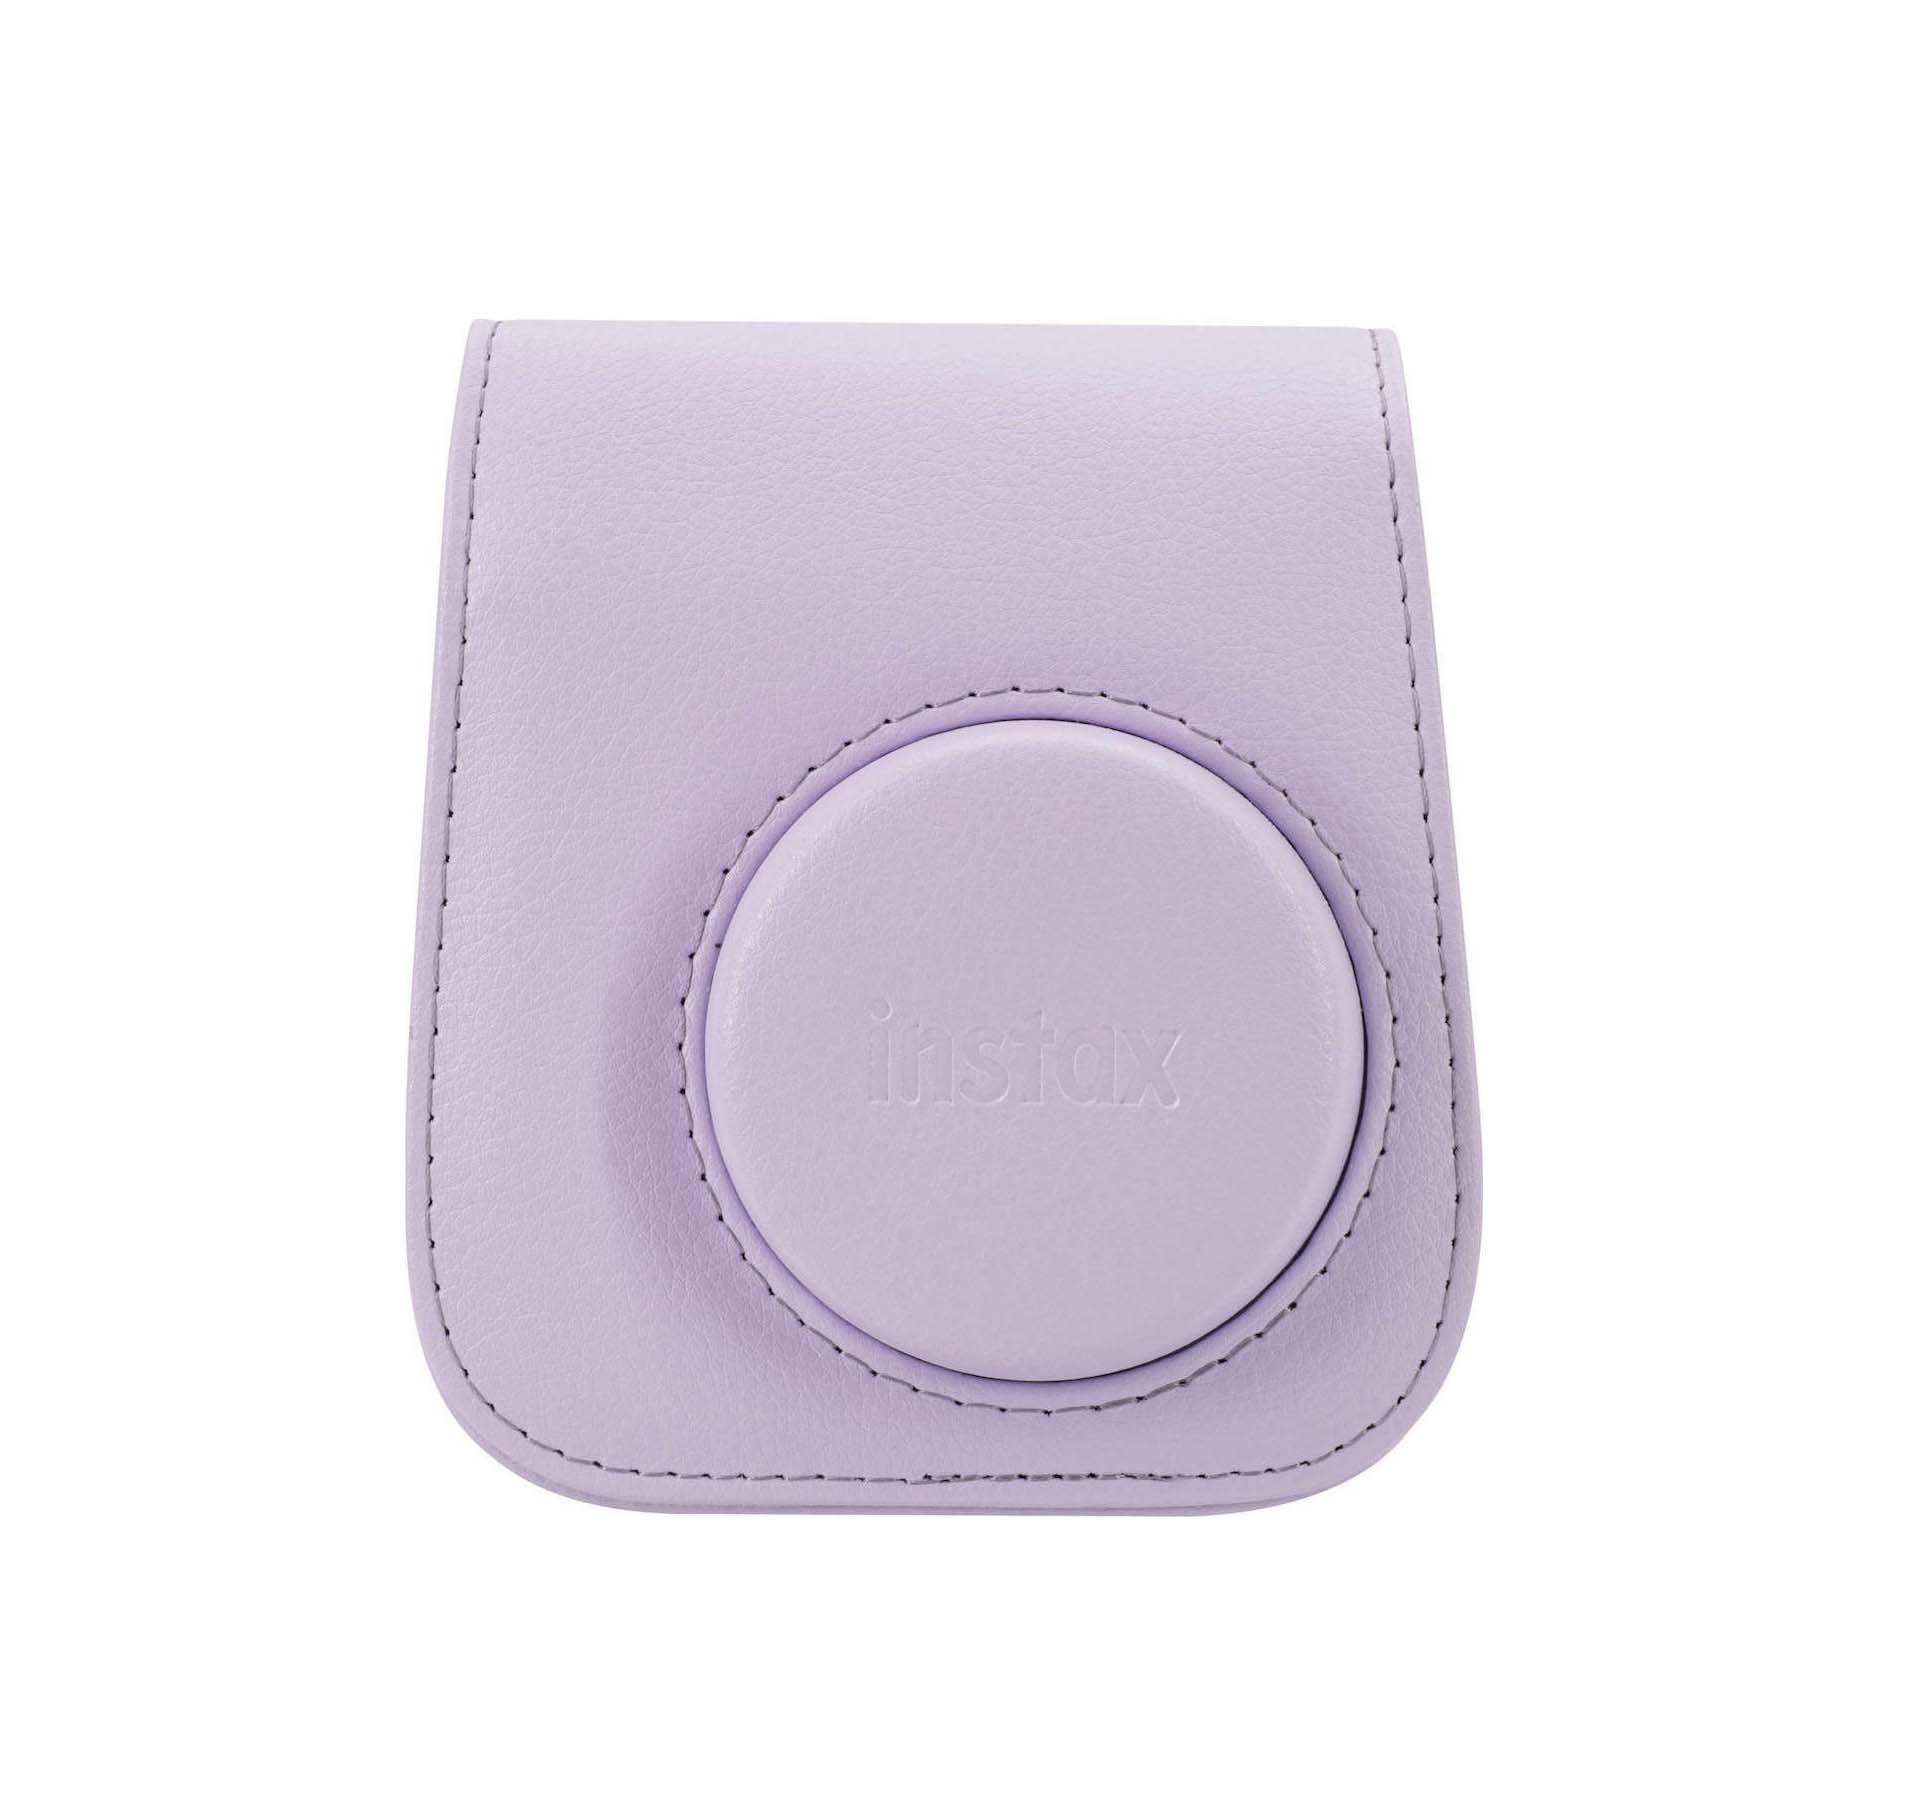 Fujifilm Camera Bag For Instax Mini 11 Lilac Purple 70100146242